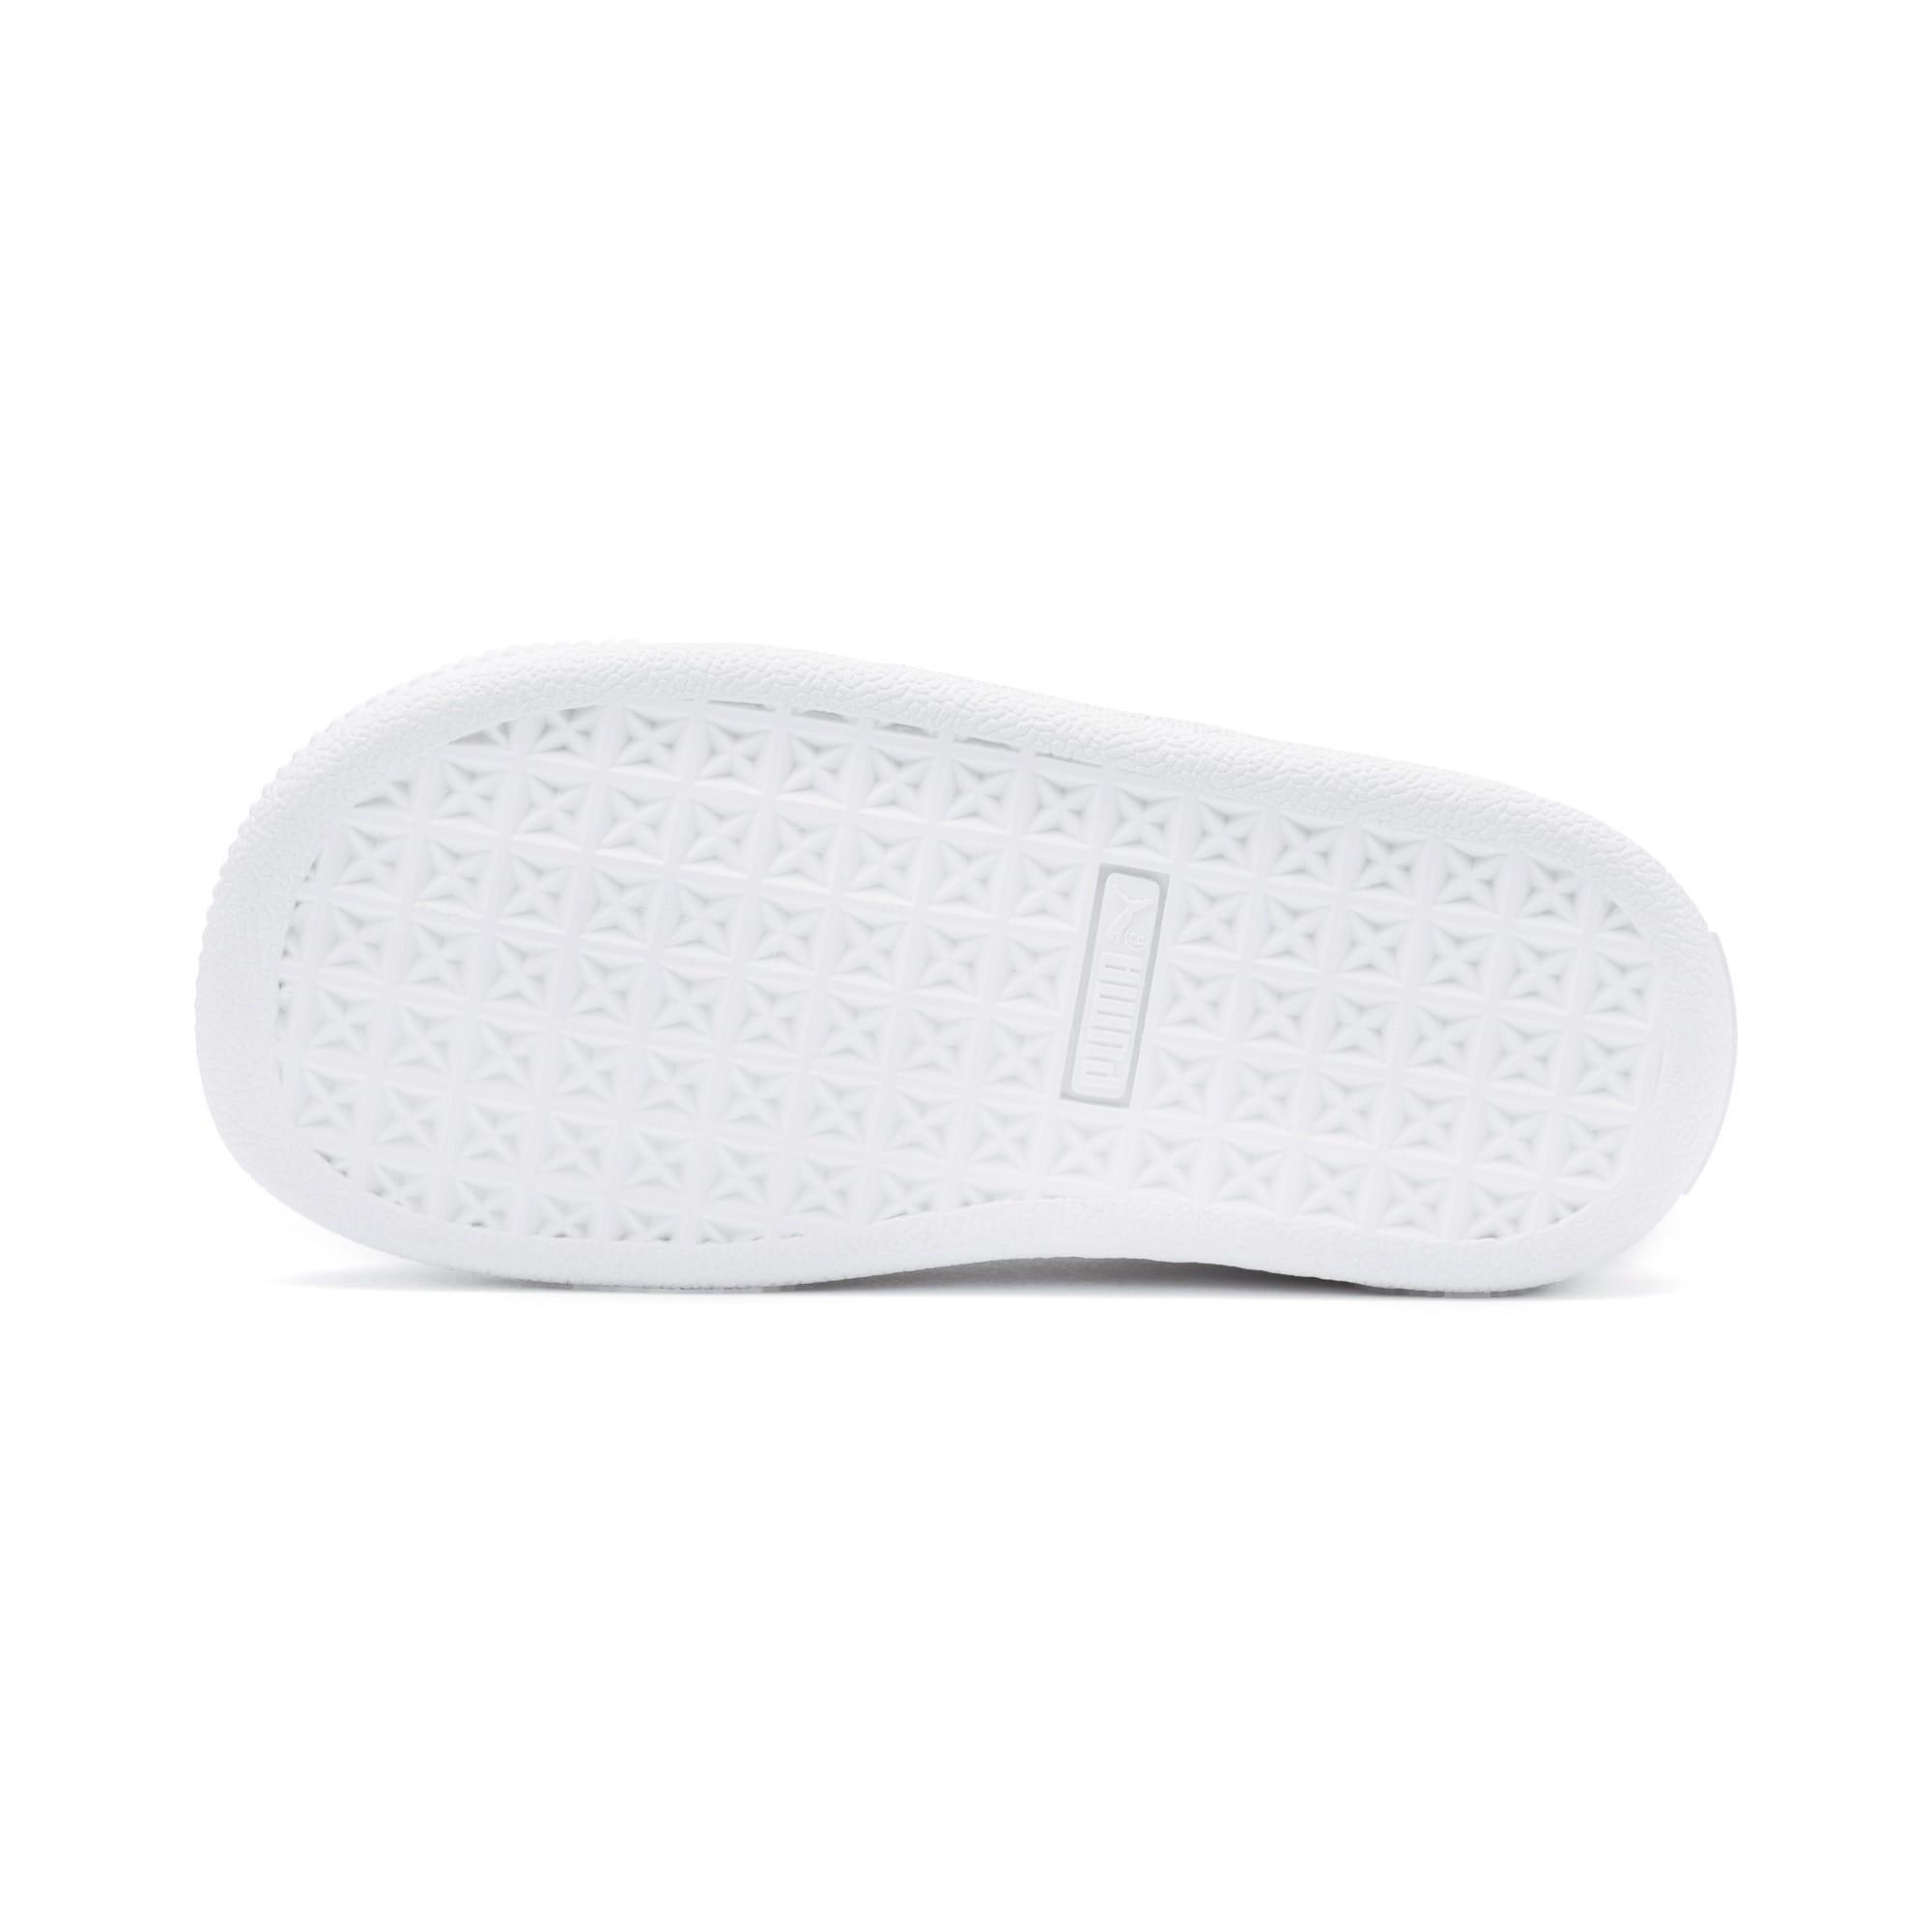 Thumbnail 4 of Basket Crush Patent AC Toddler Shoes, Puma Black-Puma White, medium